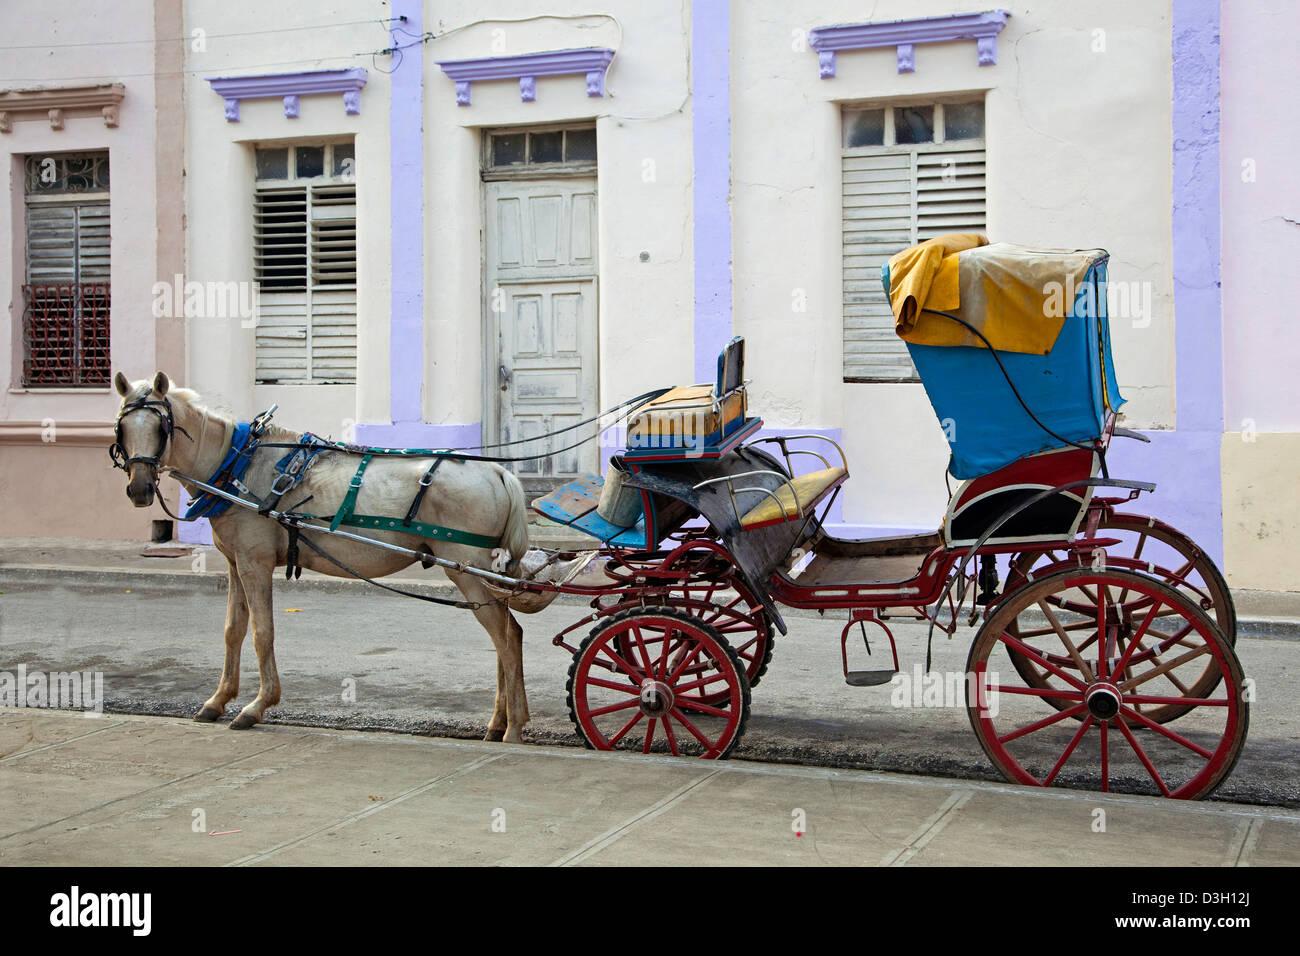 Horse and carriage in Bayamo, Granma, Cuba, Caribbean - Stock Image